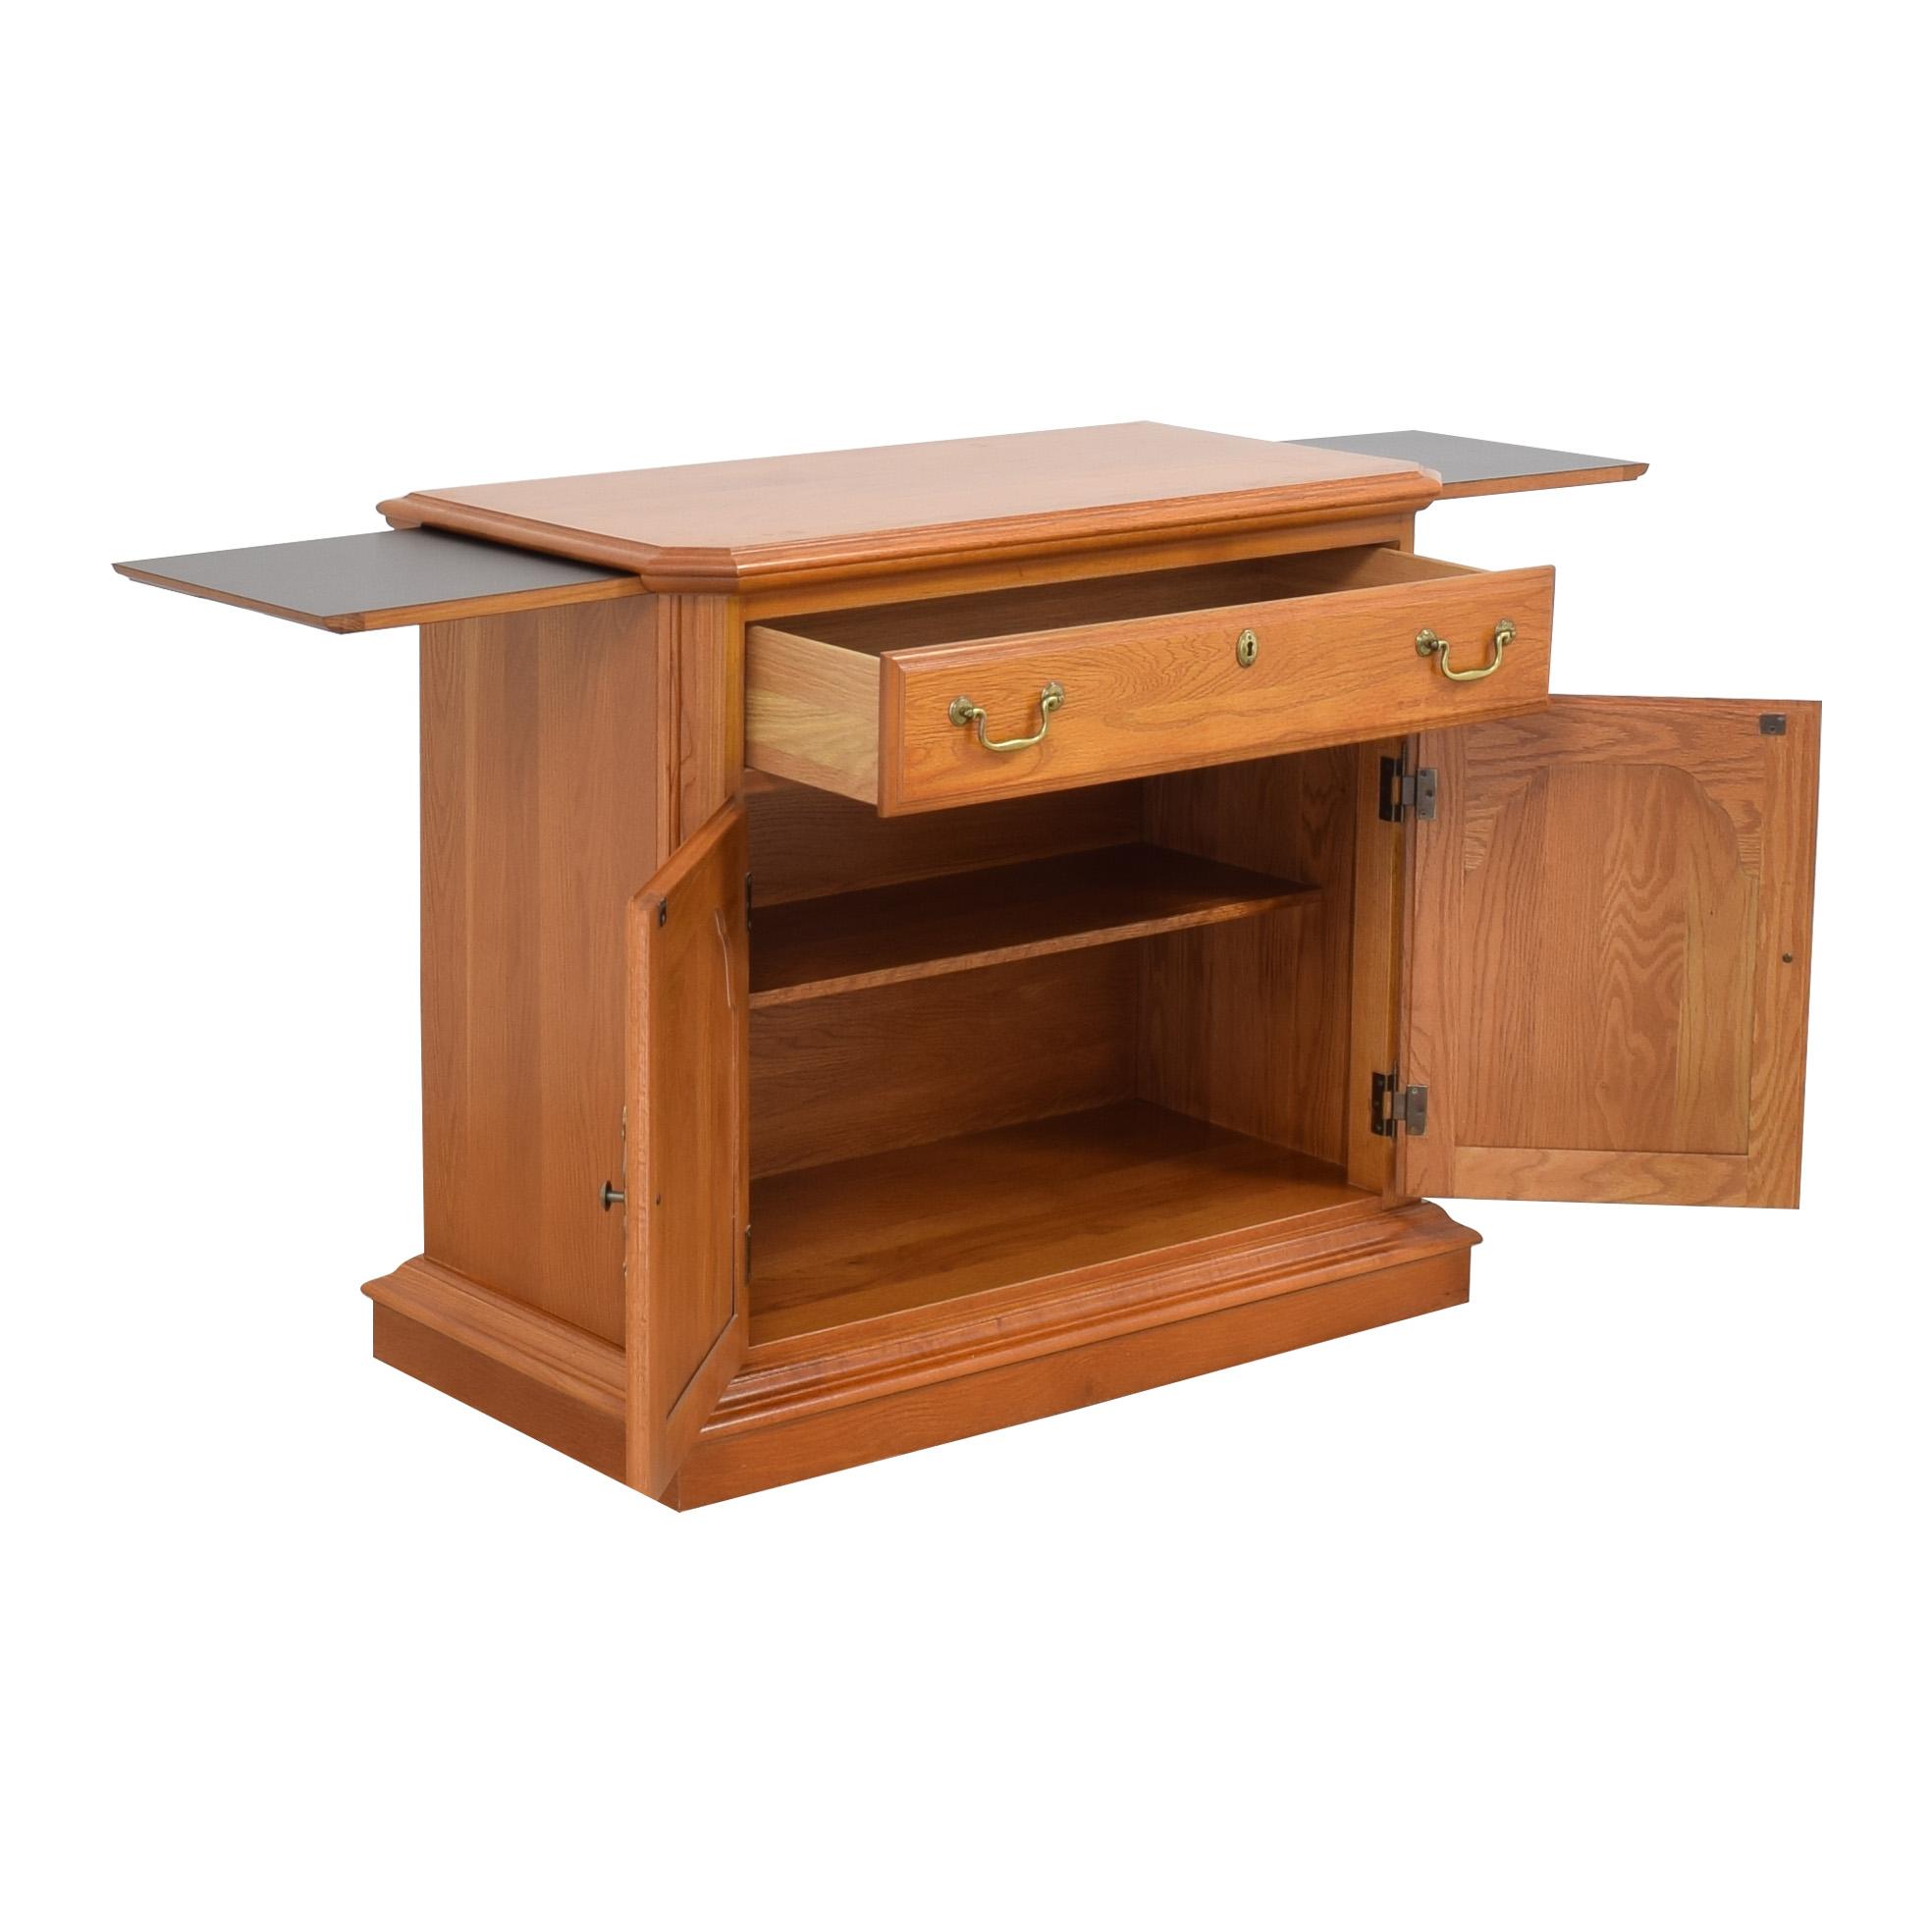 Sumter Cabinet Company Bar Cart Buffet Sideboard / Storage